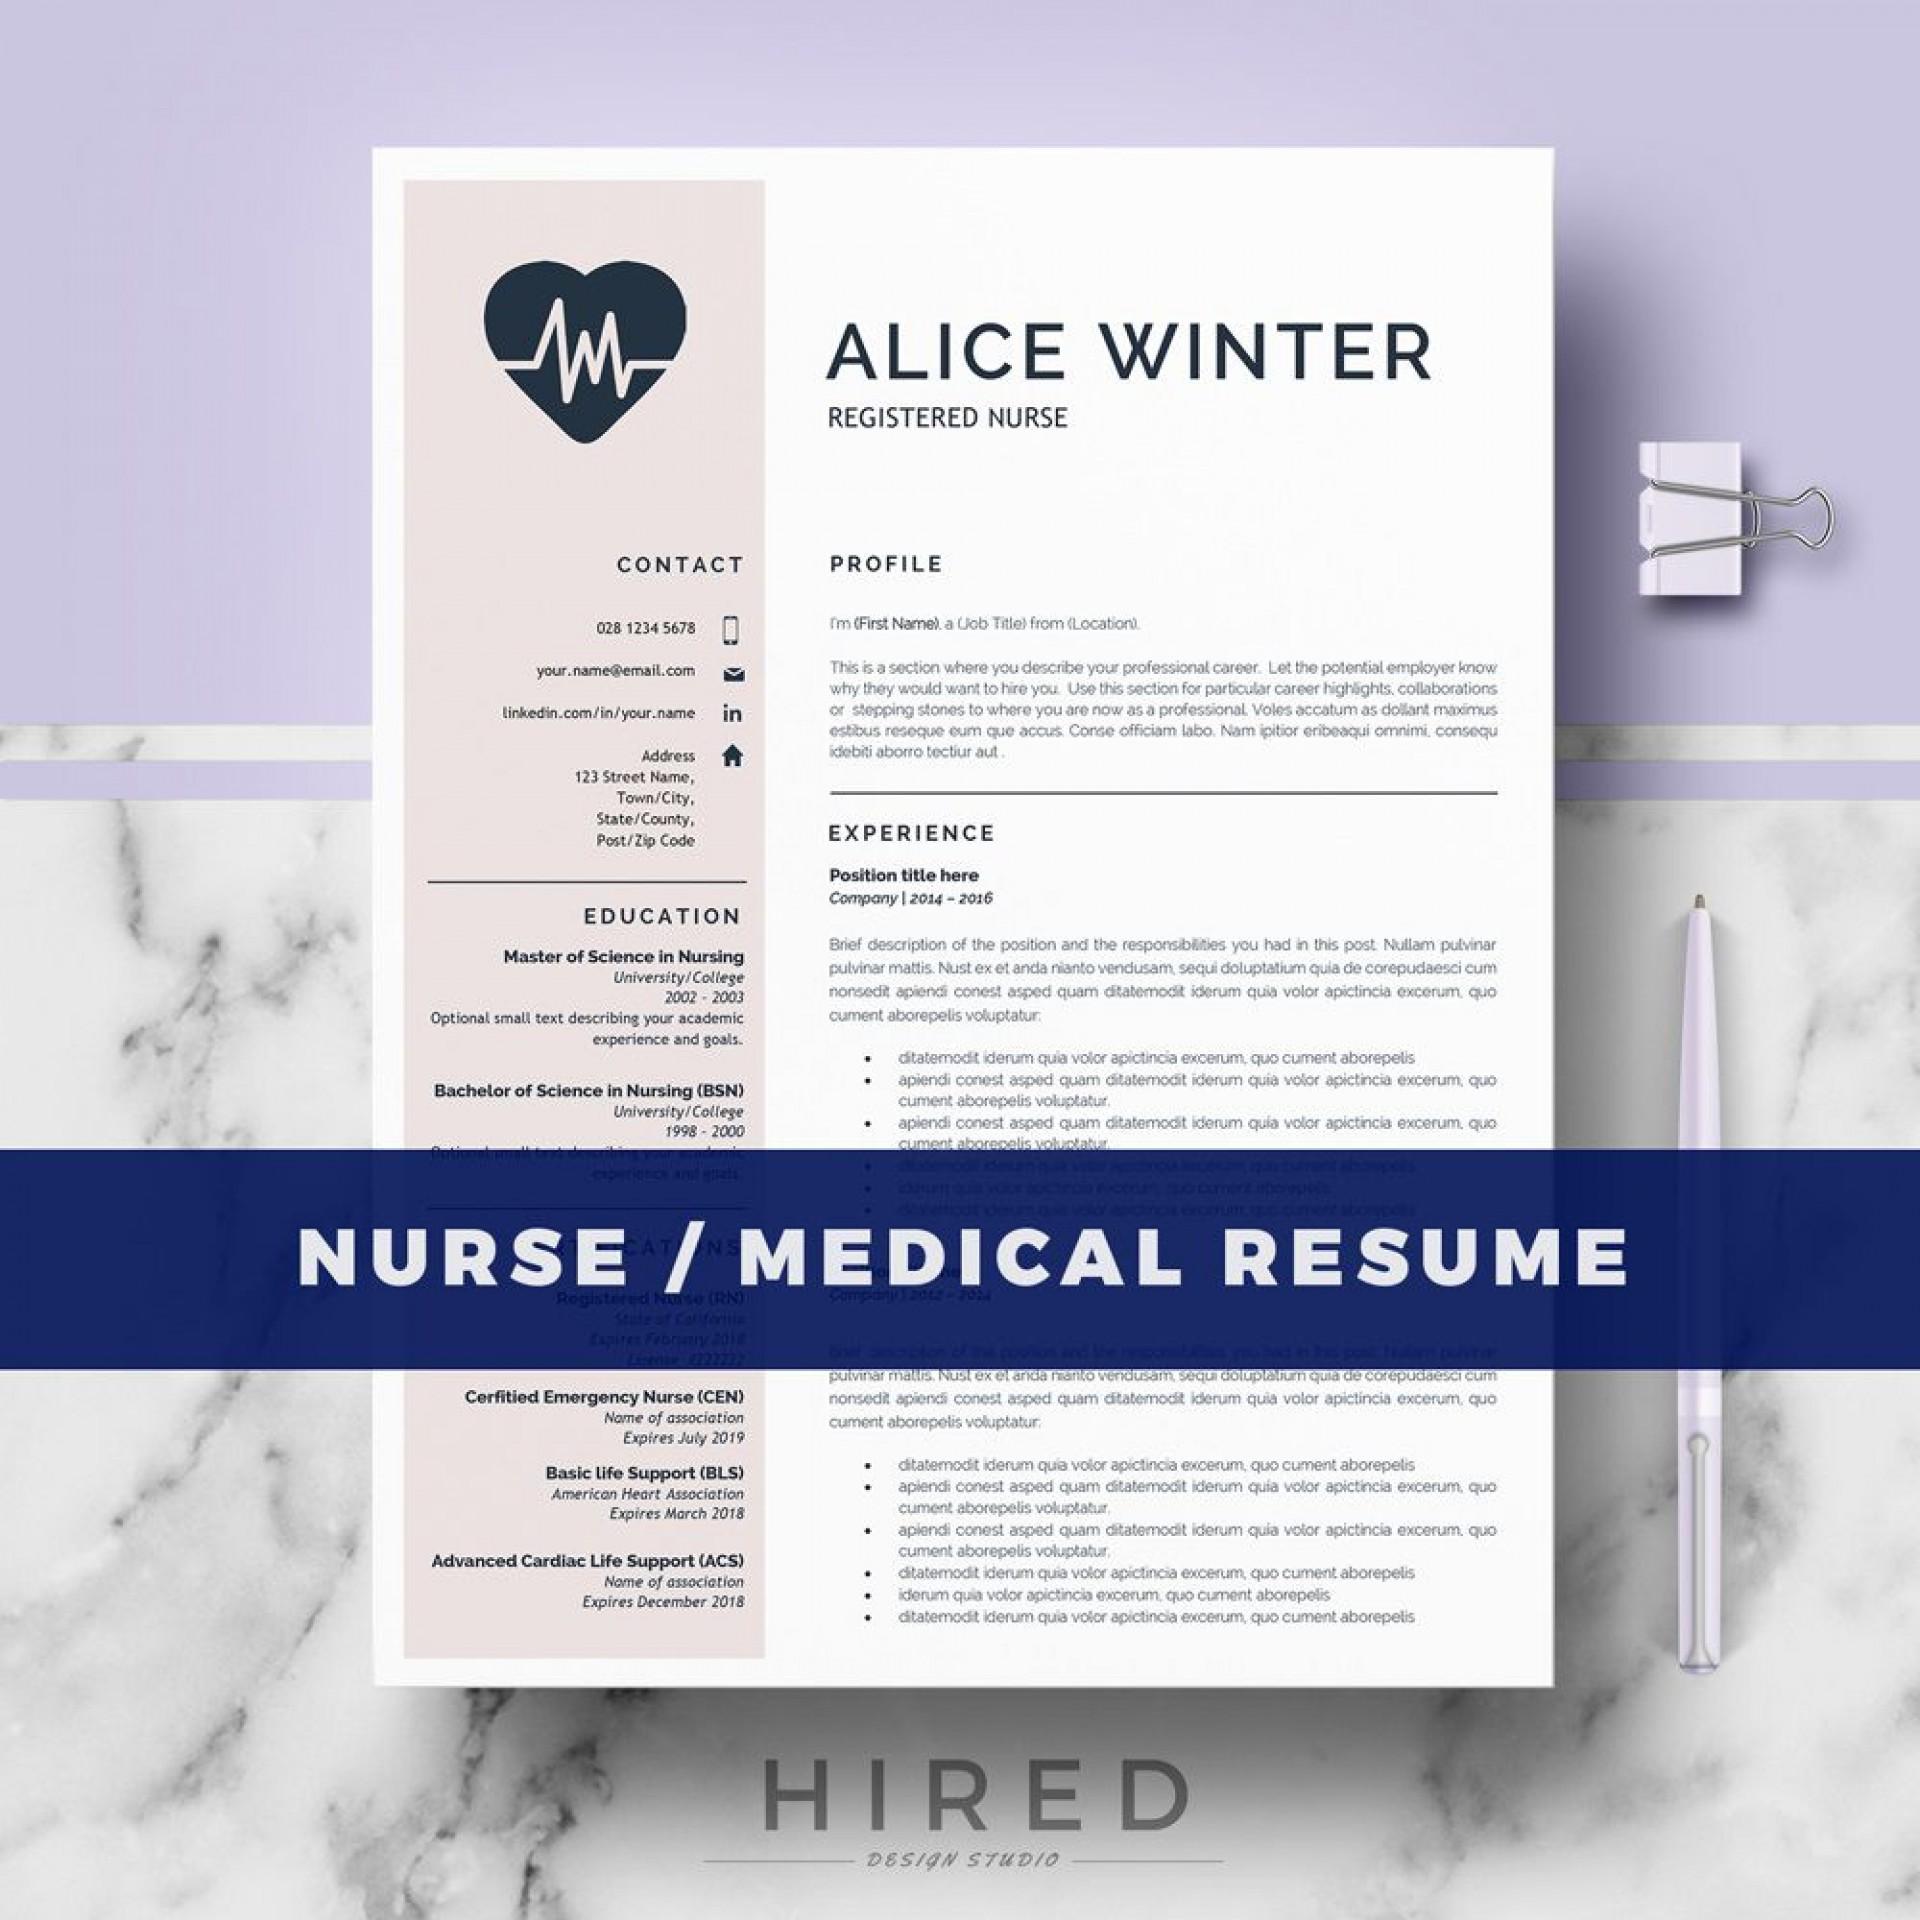 003 Rare Nurse Resume Template Word Design  Cv Free Download Rn1920